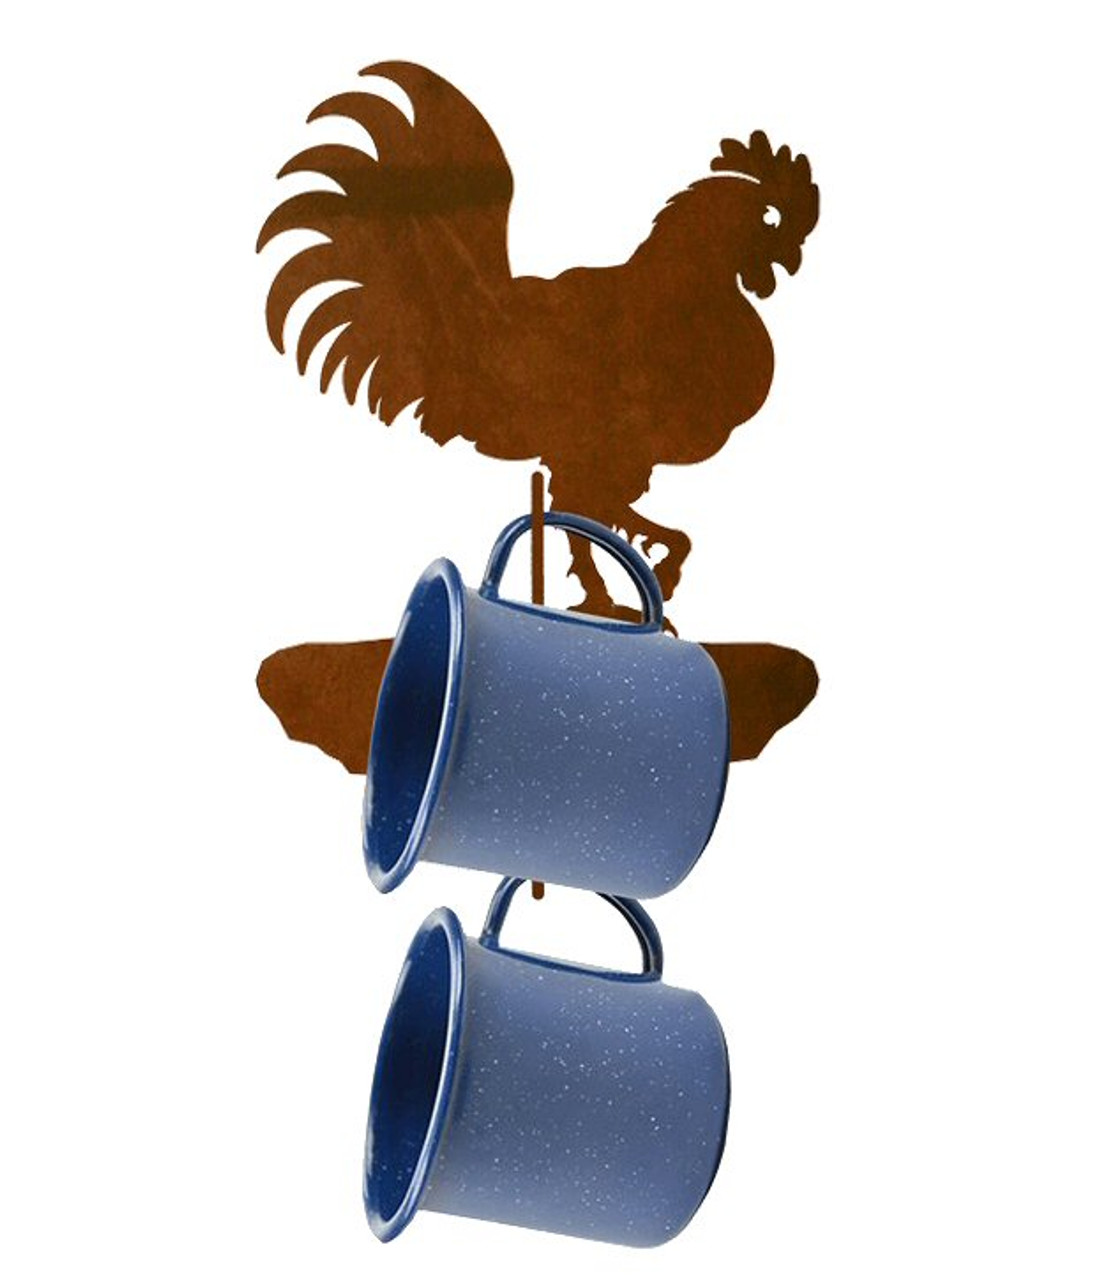 Rooster Bird Metal Mug Holder Wall Rack Coffee Cup Holder